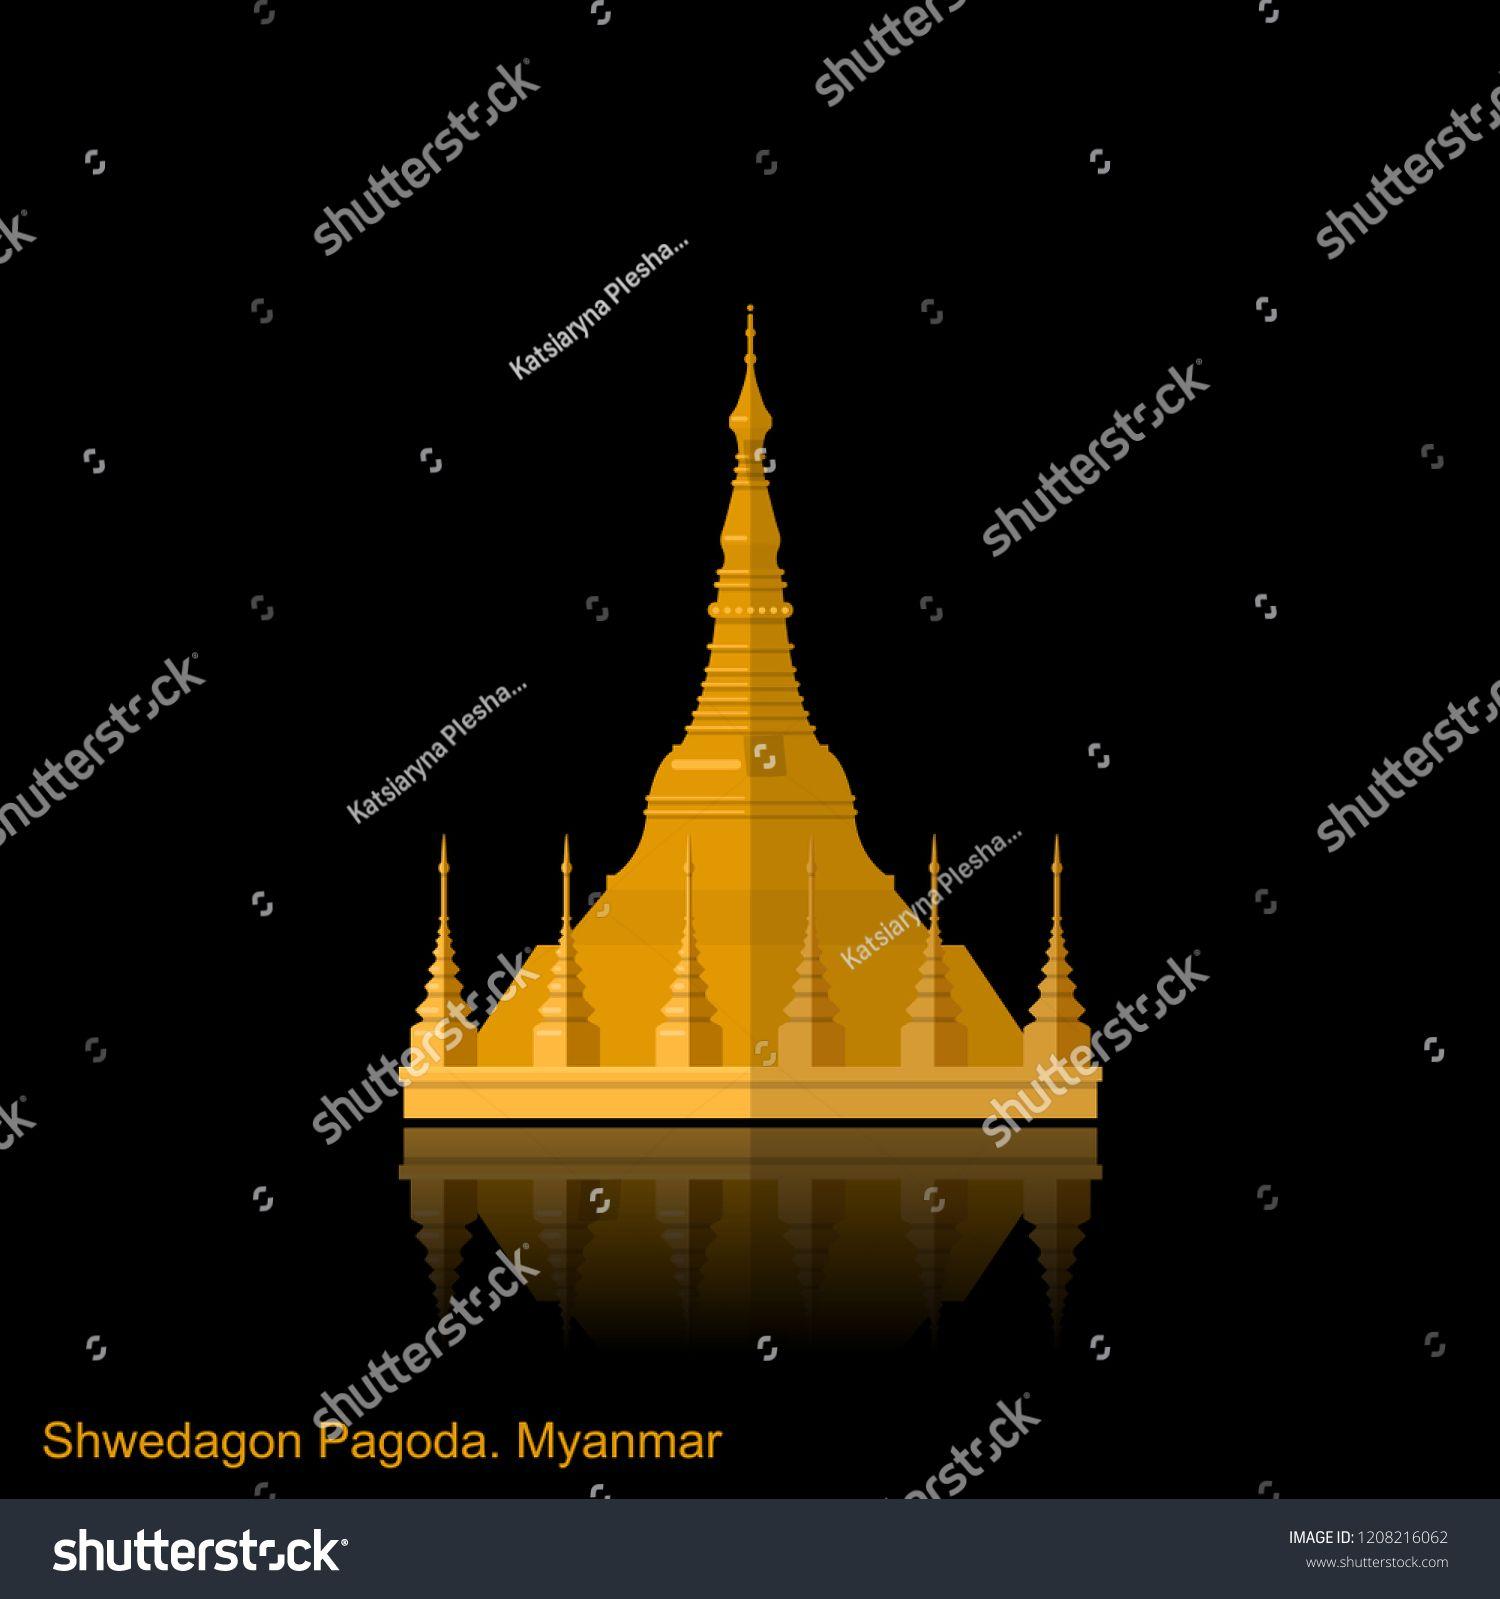 Myanmar Travel Destination Yangon Symbol Shwedagon Pagoda Tourism Concept Culture And Architecture Famous Landmark Shwedagon Pagoda Myanmar Travel Pagoda